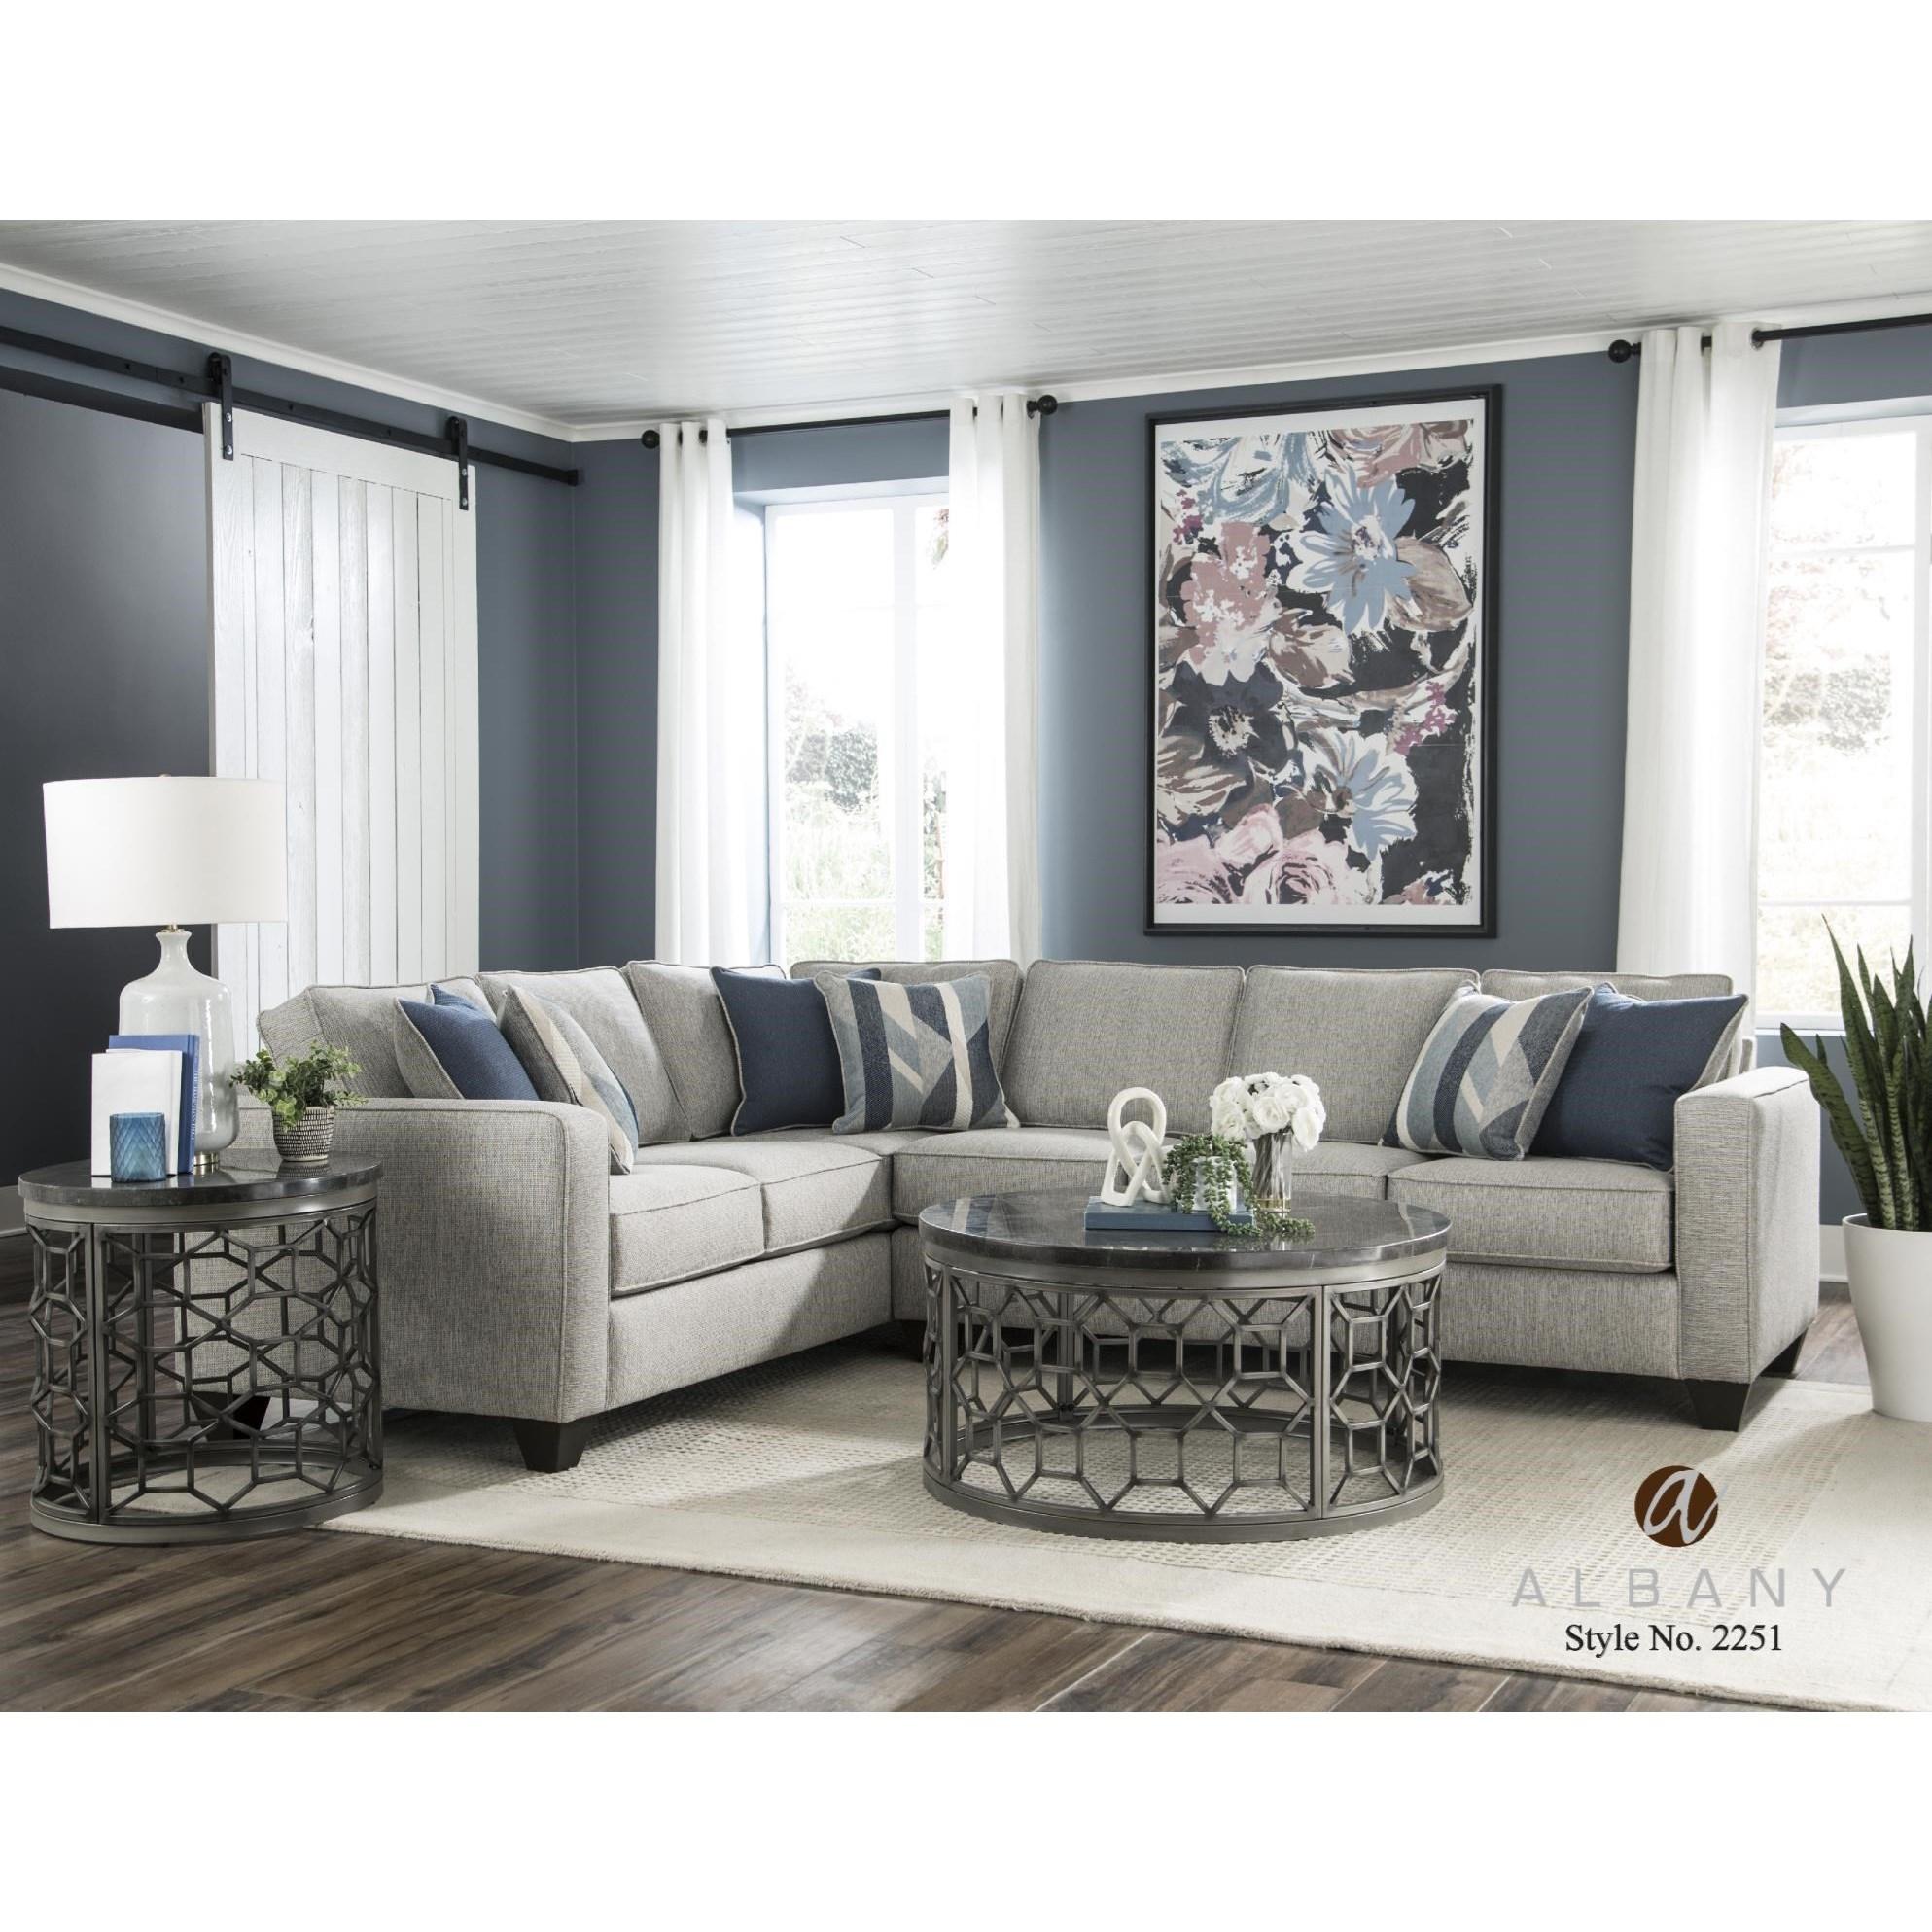 2 PC Sectional Sofa Sleeper